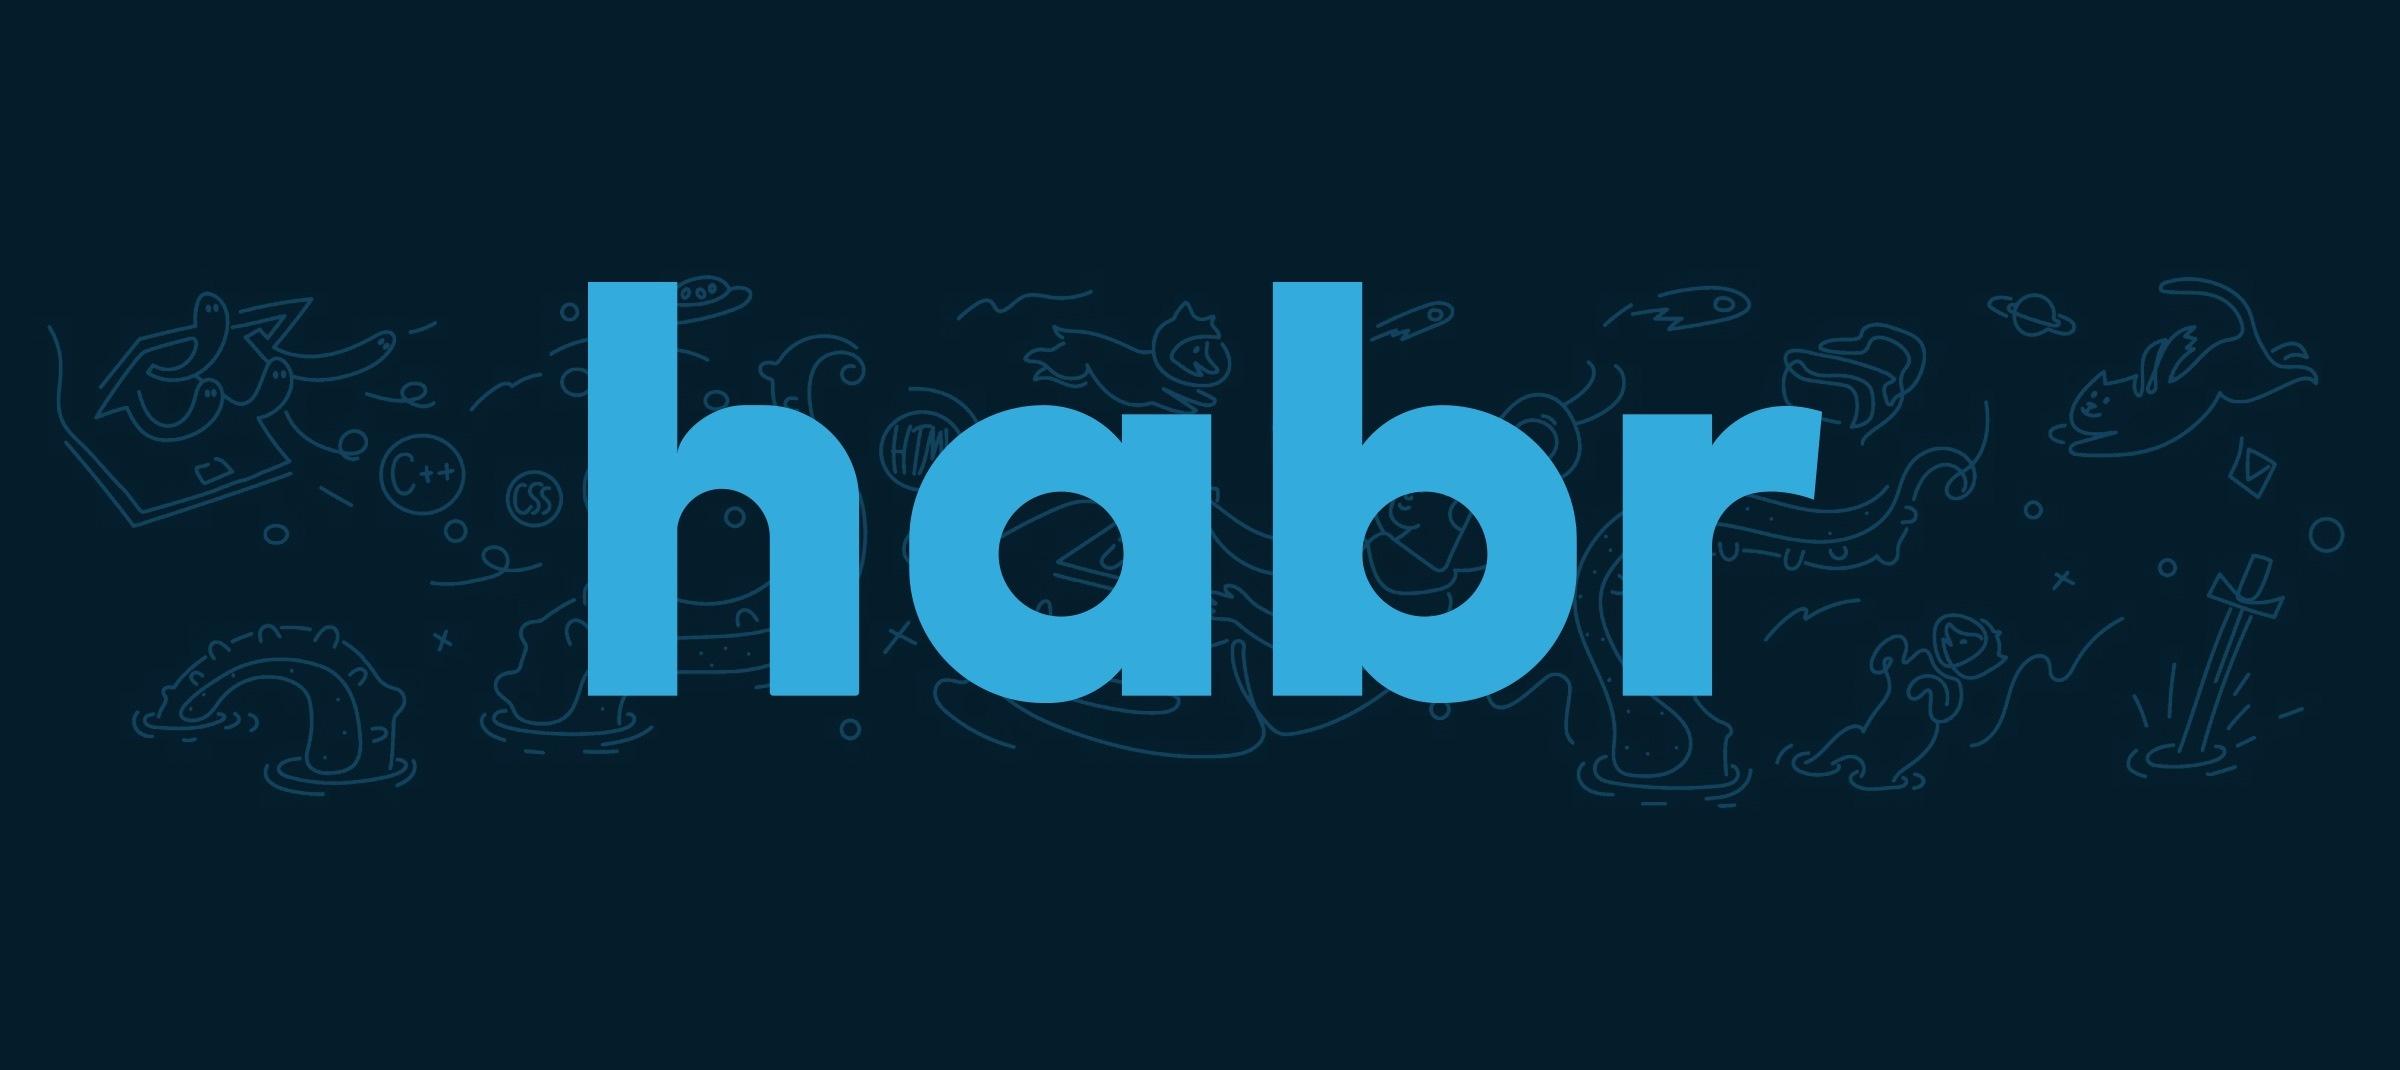 content_HABR-LOGO.jpg